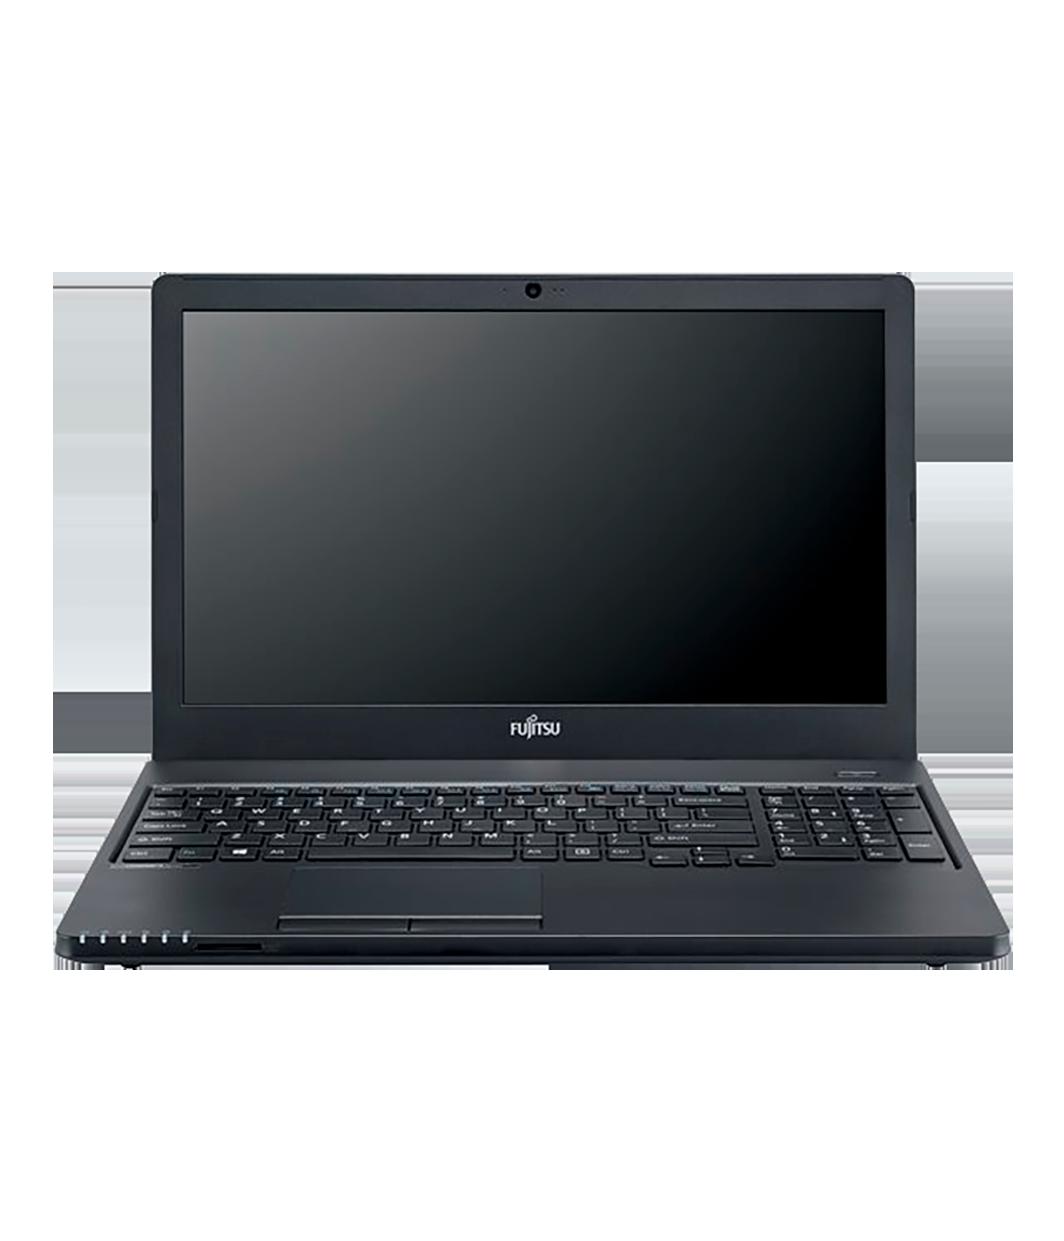 Fujitsu LIFEBOOK A555 128GB